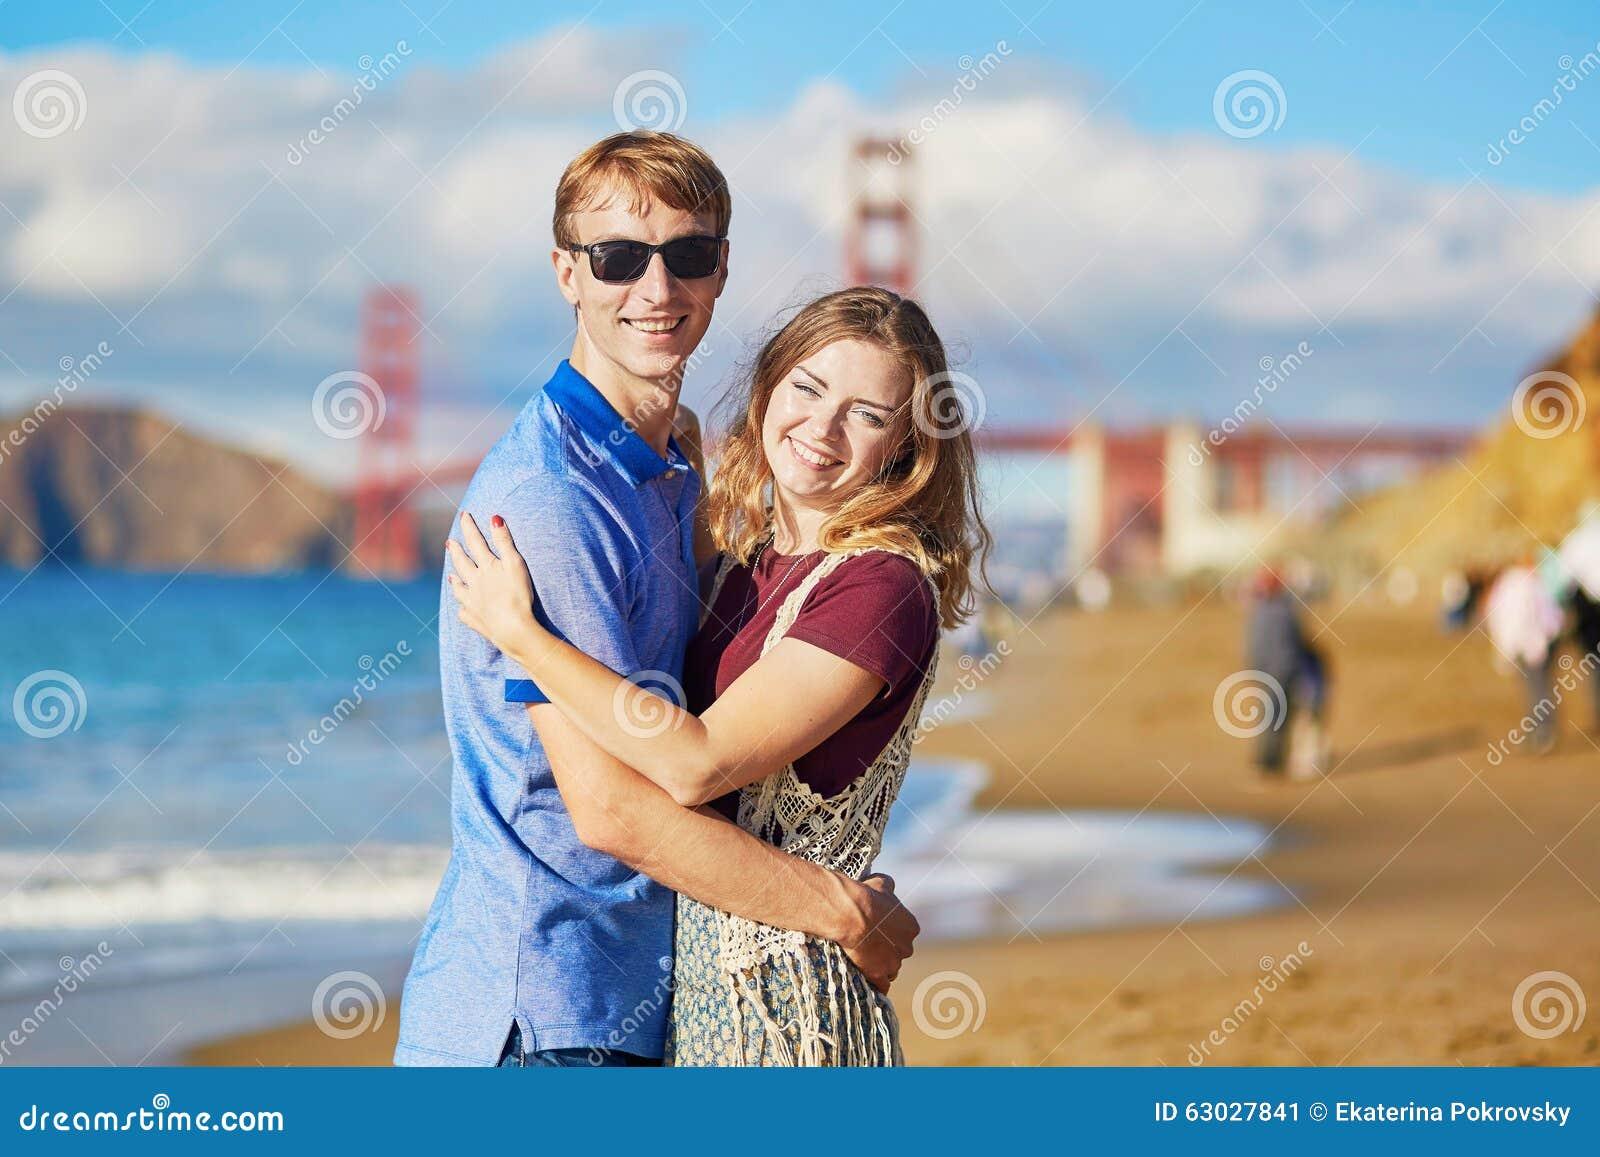 Interracial hastighet dating Los Angeles